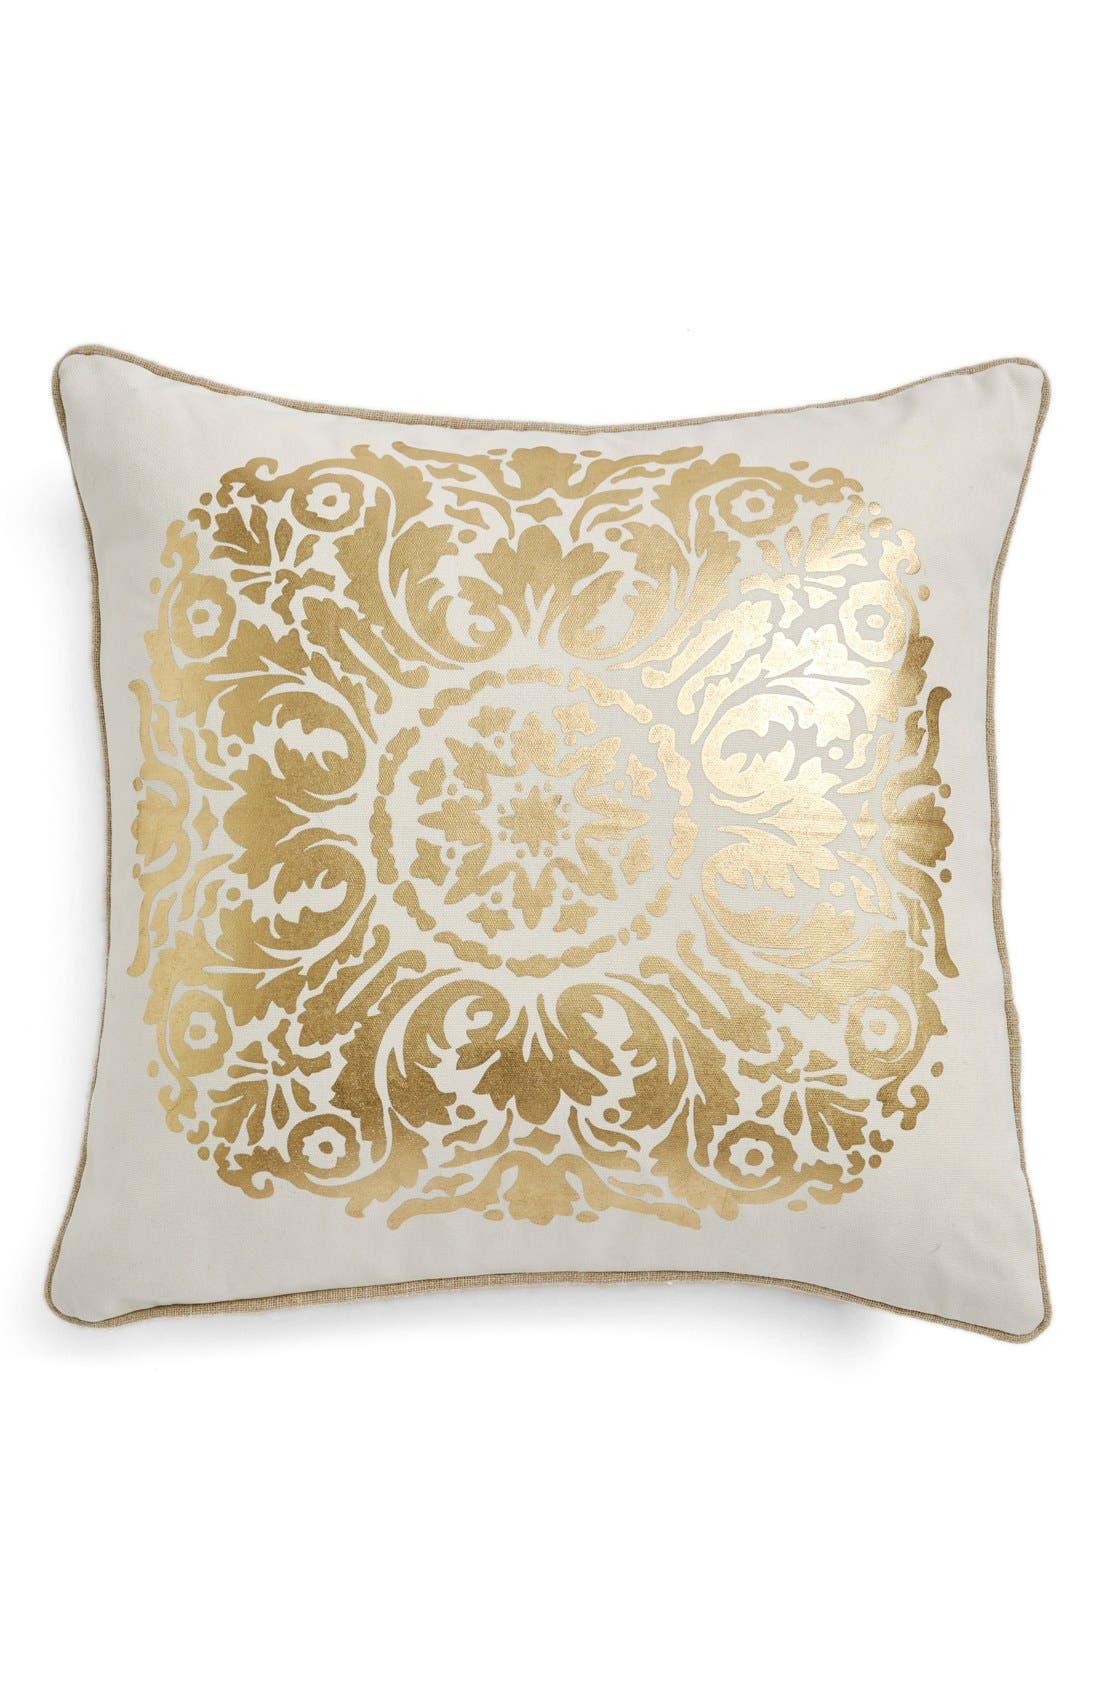 Main Image - LevtexGold Medallion Print Pillow